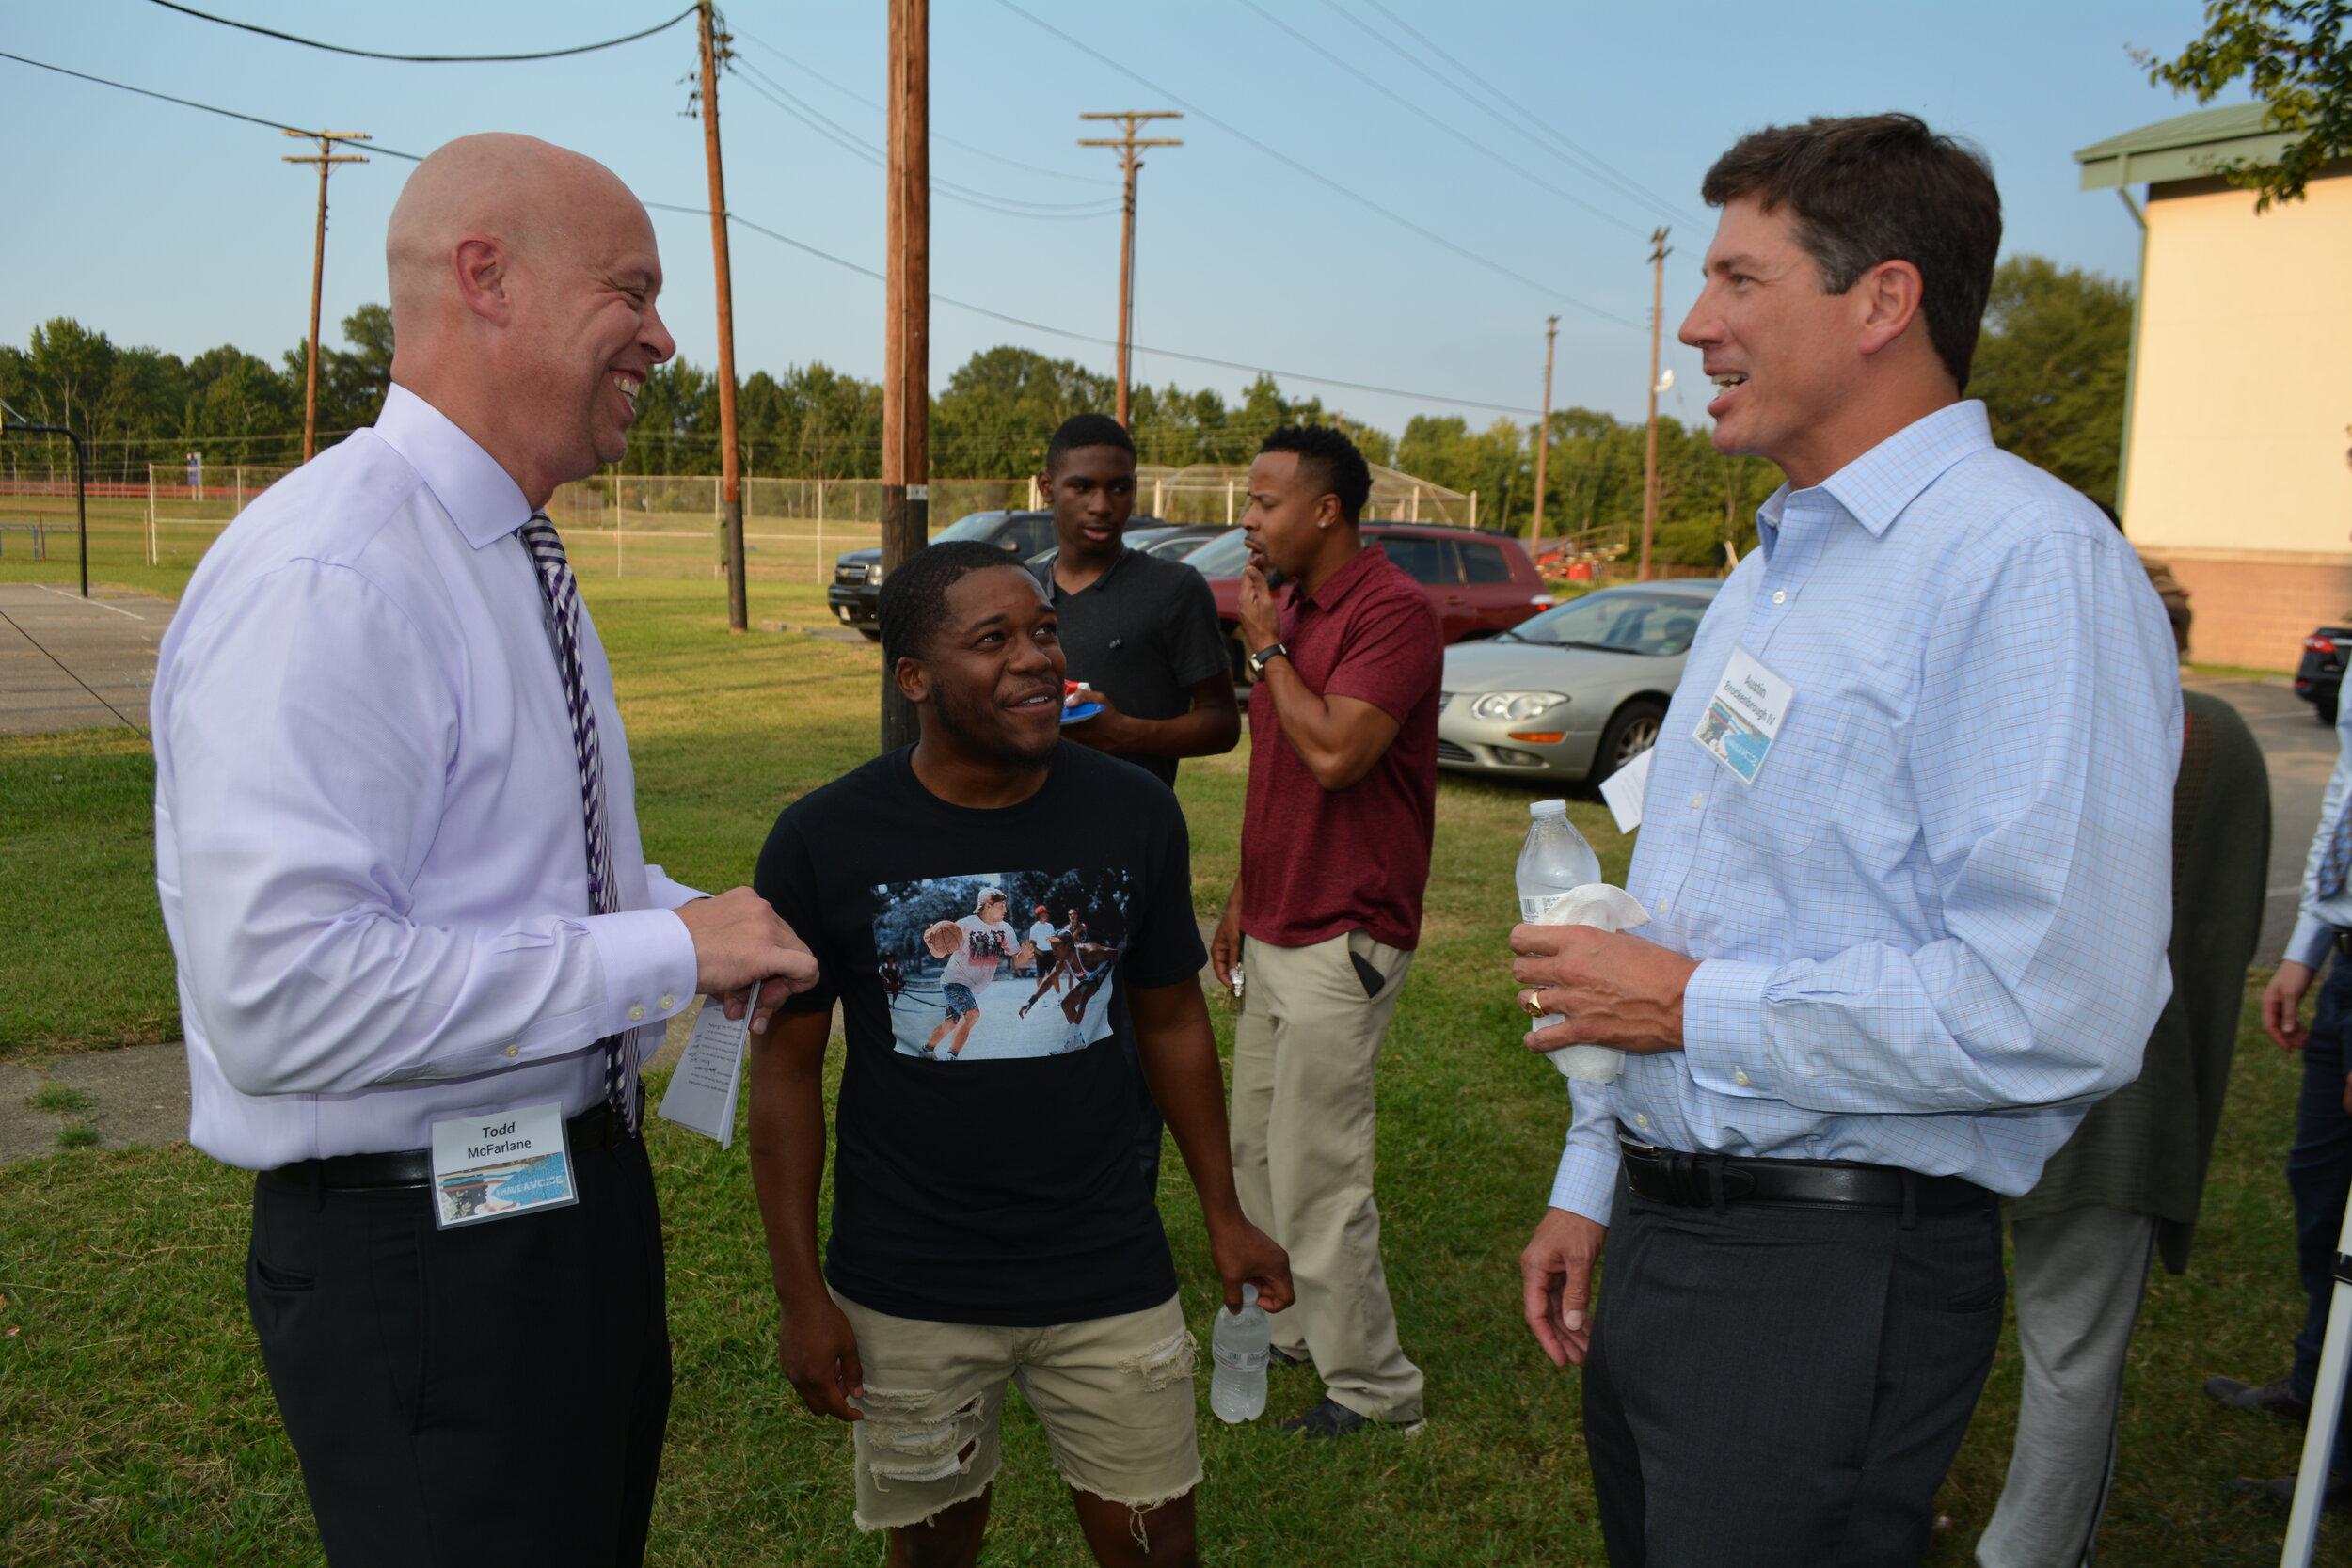 Todd McFarlane, president & CEO, and alum Bratavious Watts enjoy a laugh with longtime friend Austin Brockenbrough IV.